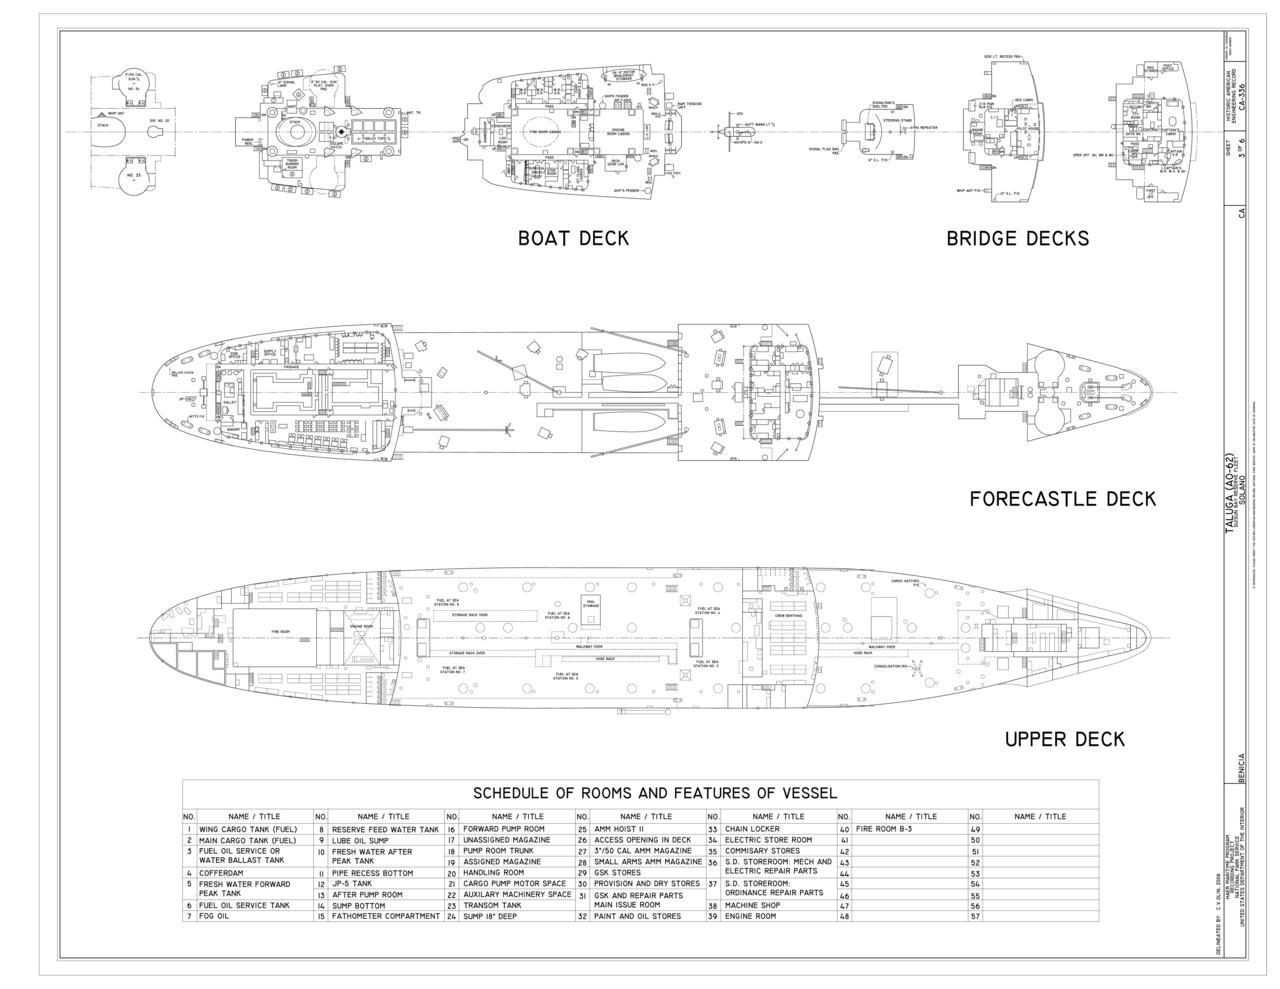 file:plans- 3'-50 cal  gun platform, boat deck house top and fidley top,  boat deck, radar platform lower, pilot house top, navigation bridge, upper  bridge